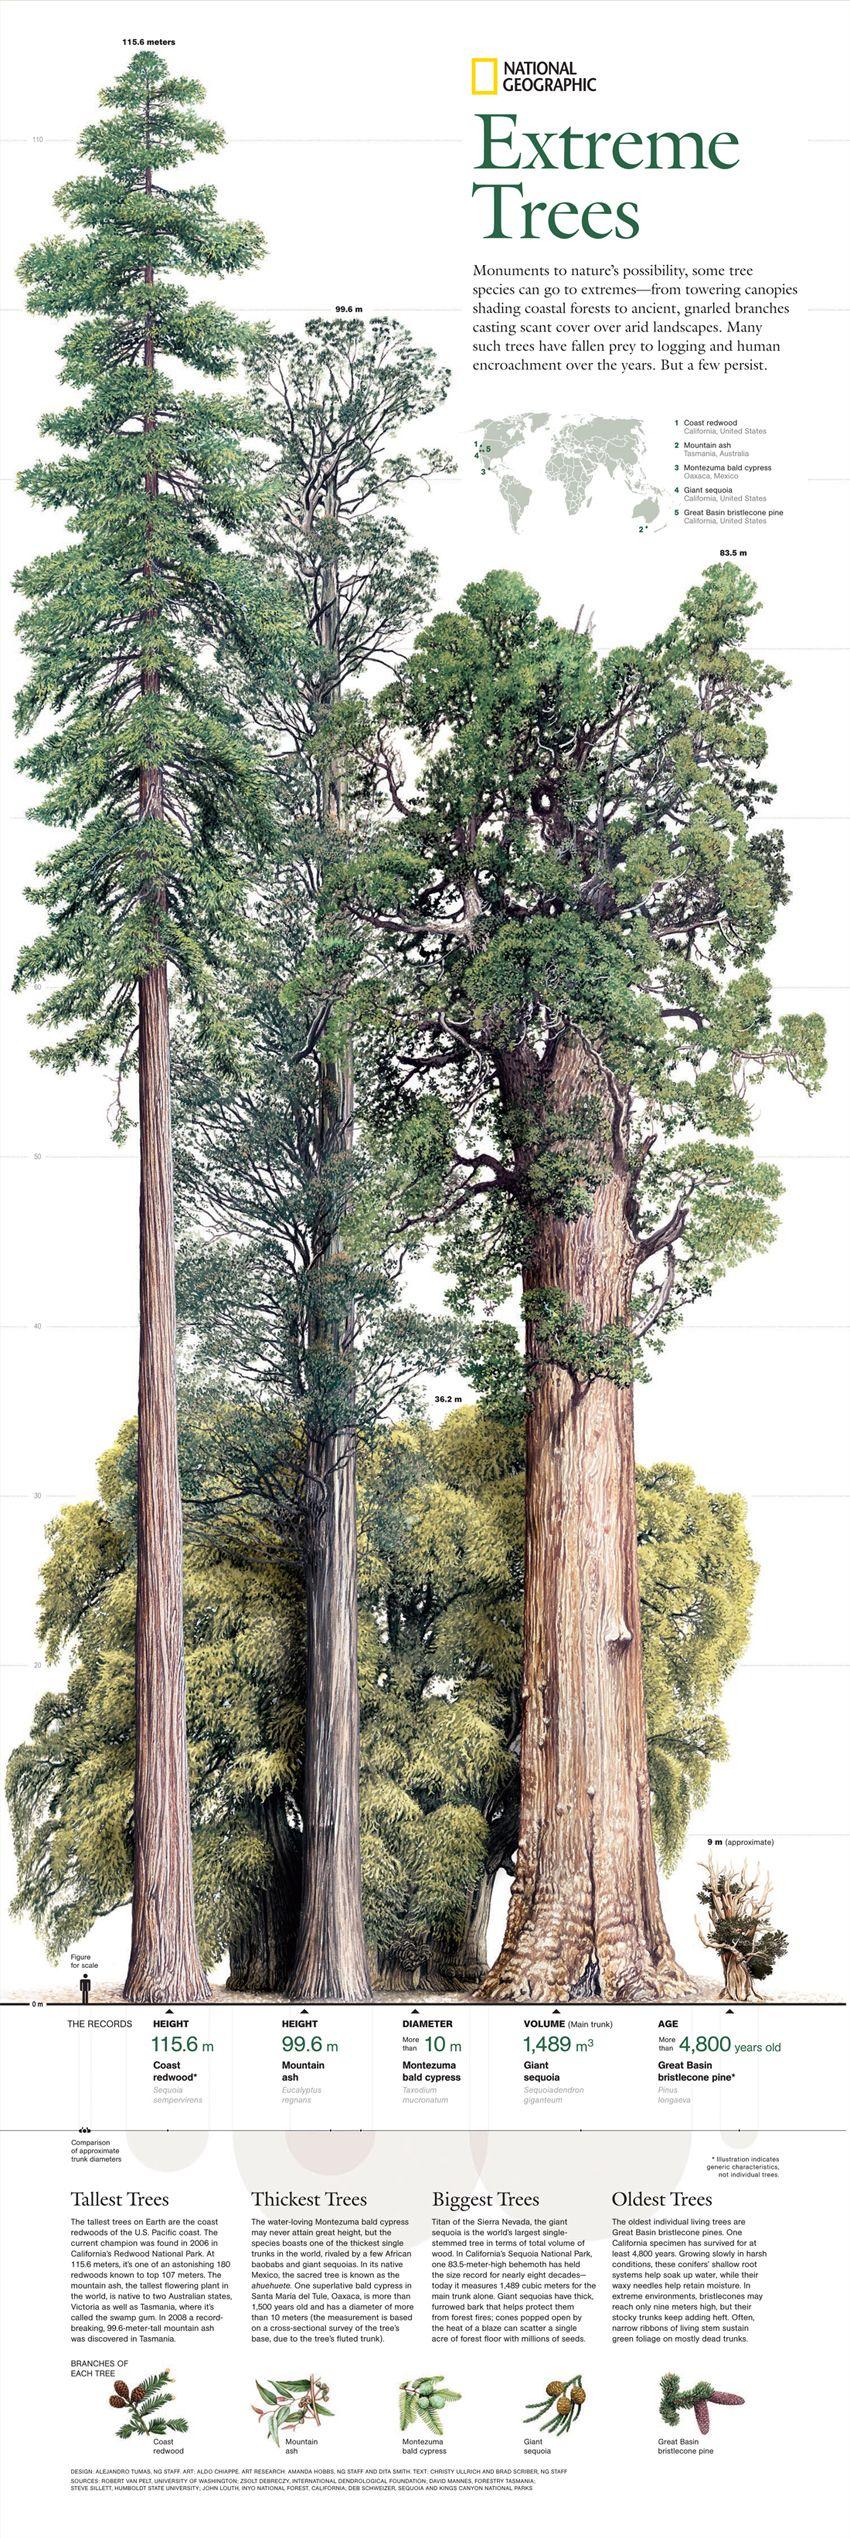 Extreme trees coast redwood tallest tree 115 6 meters montezuma